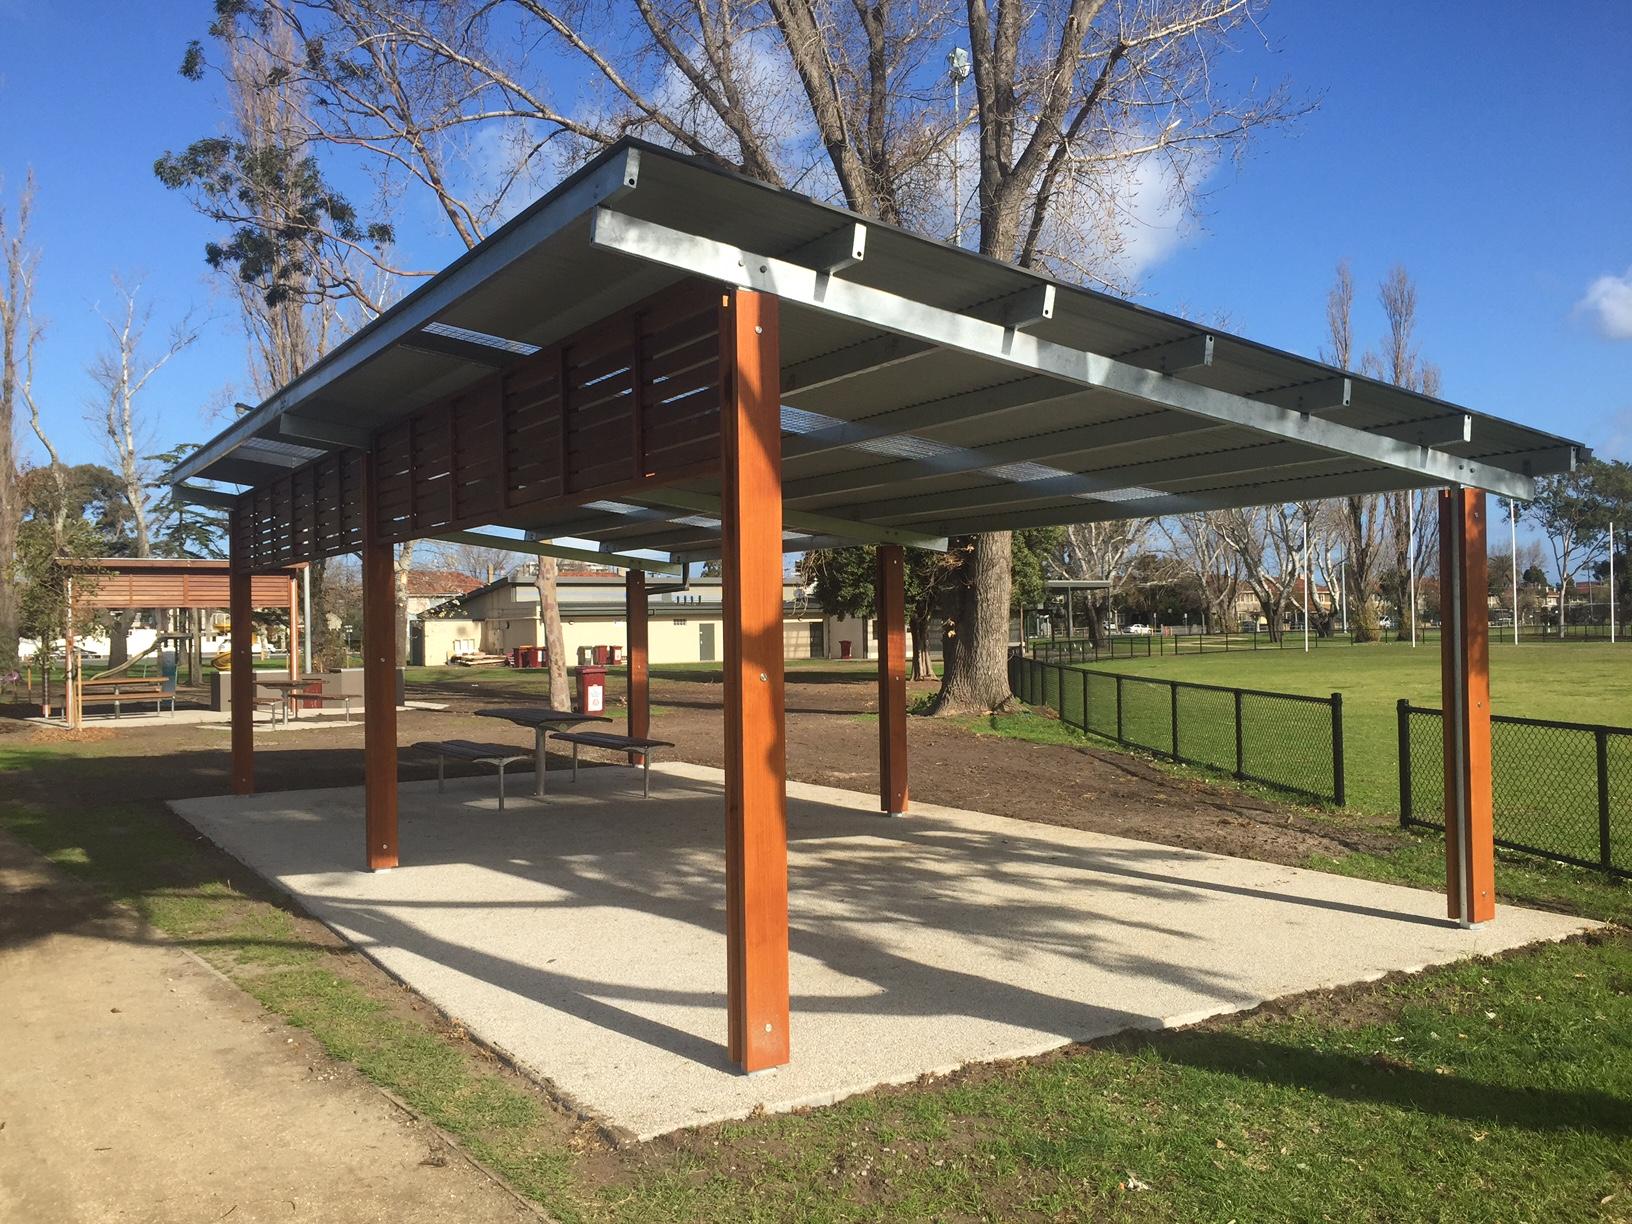 Grdc City Of Port Phillip Murphy Reserve Shelters